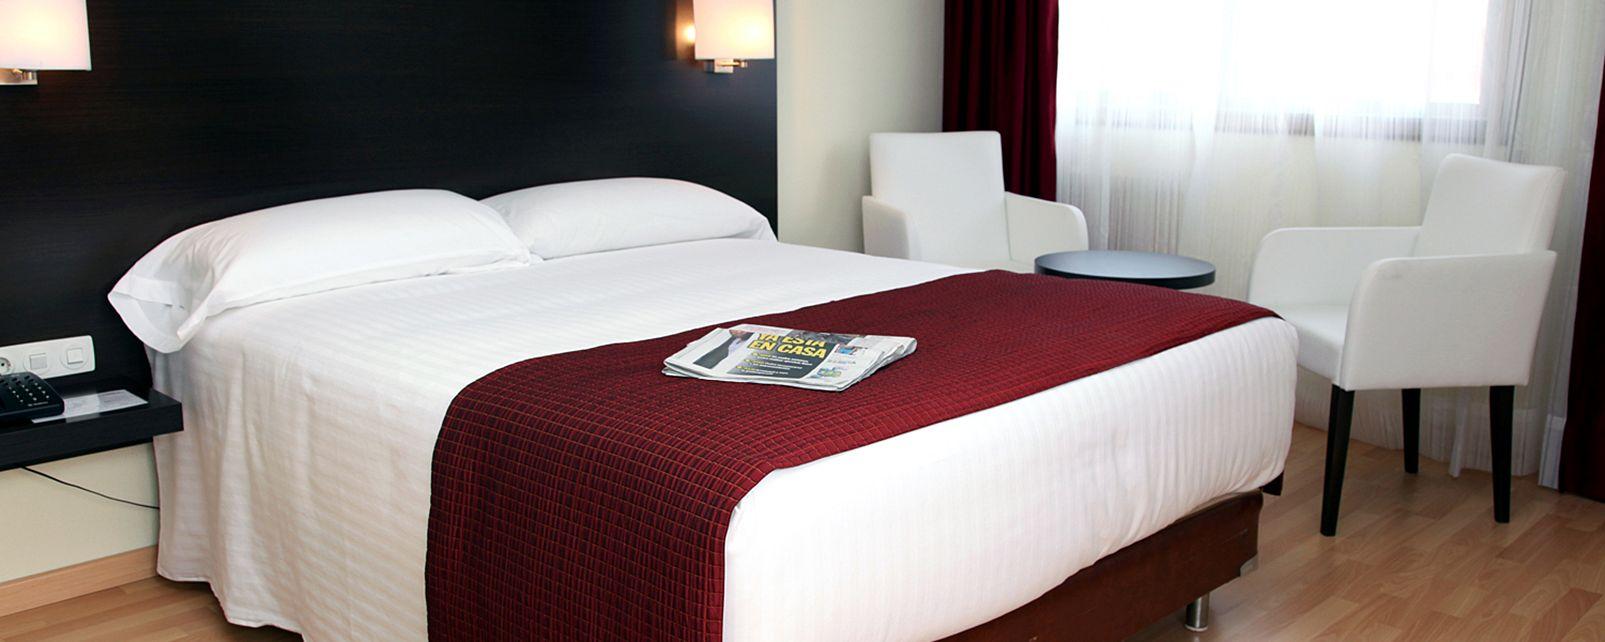 Hotel Husa Santiago Ap�stol